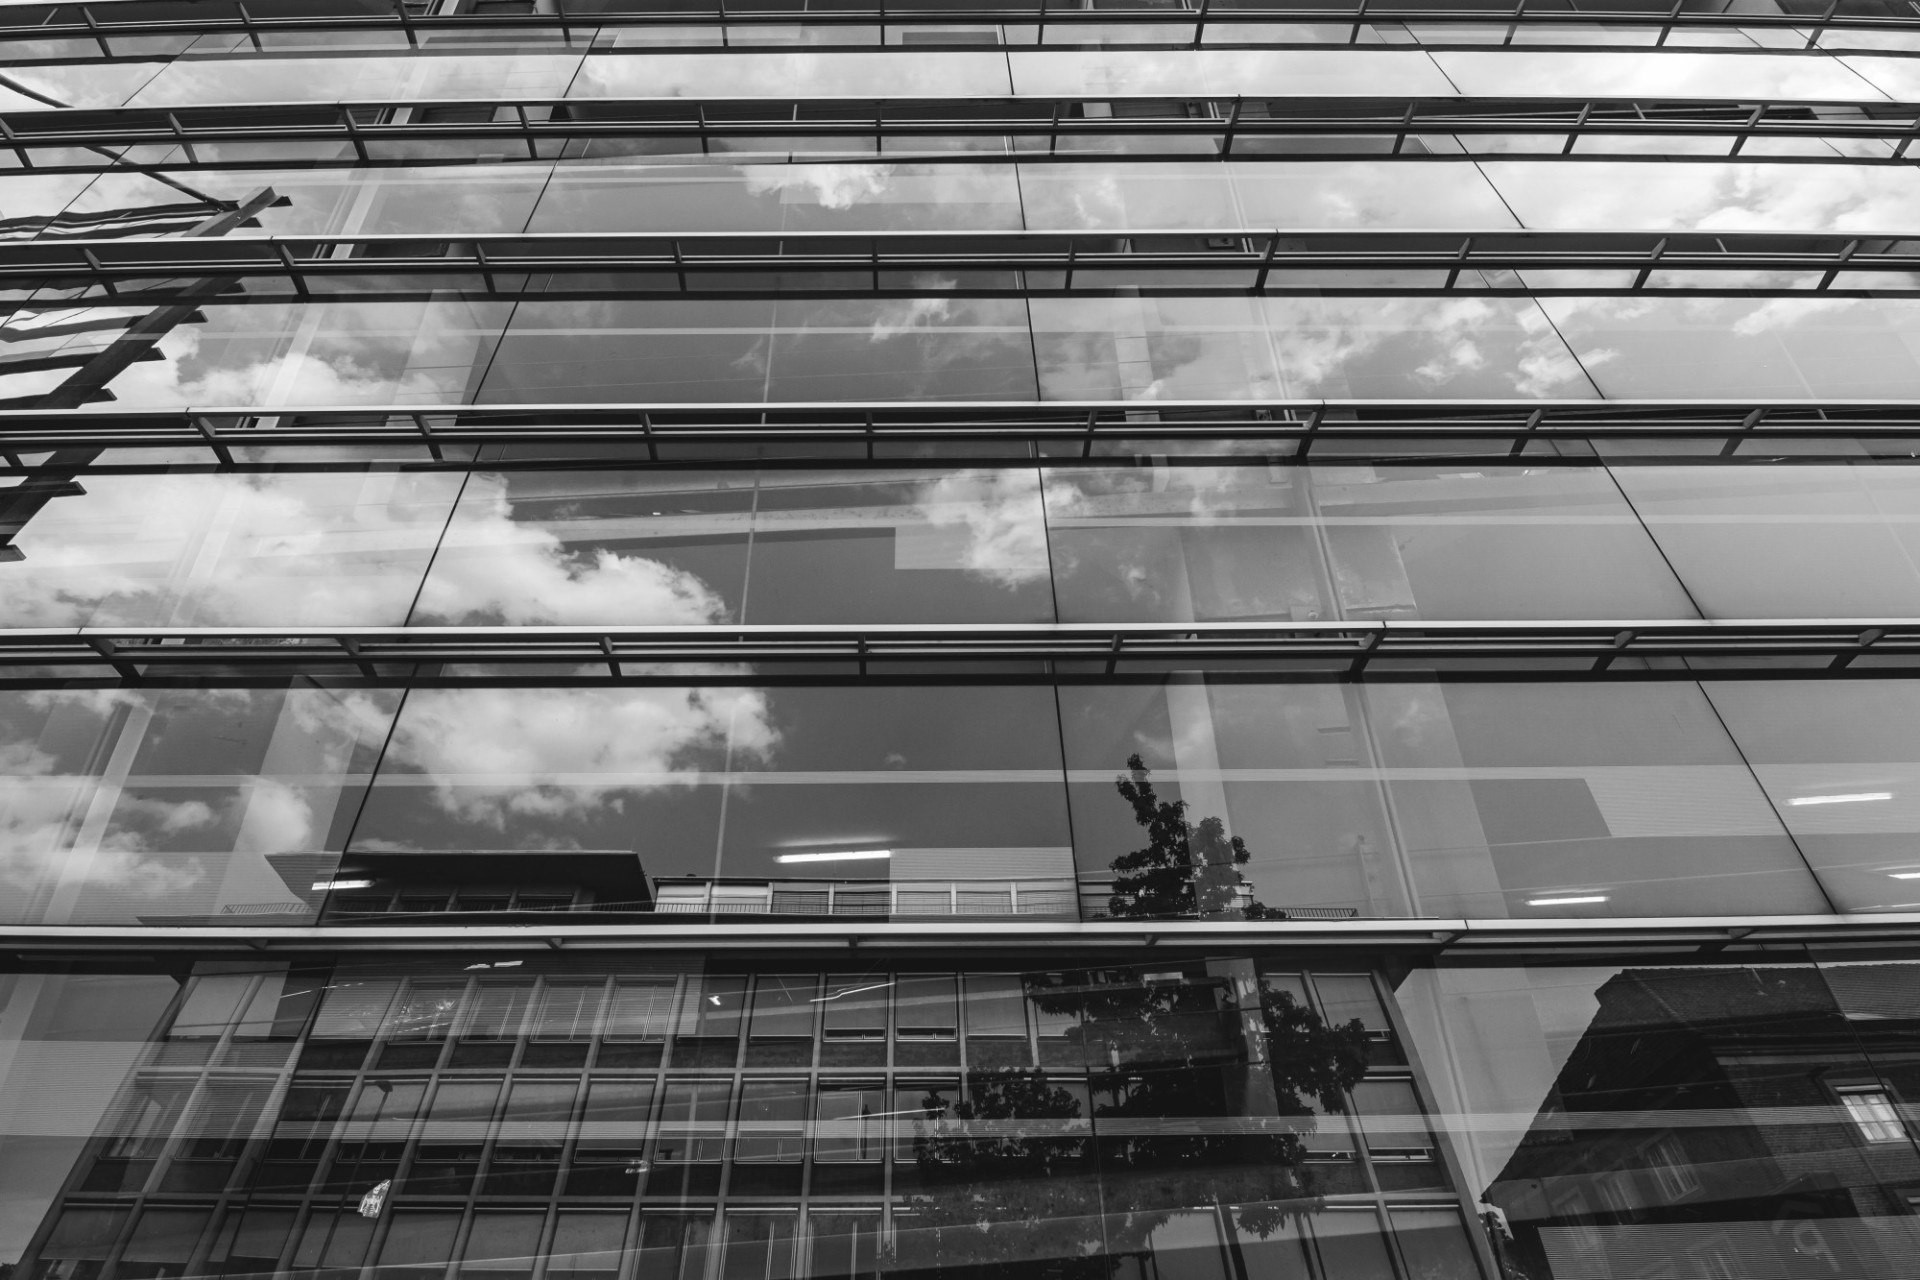 Modern architecture reflecting facade